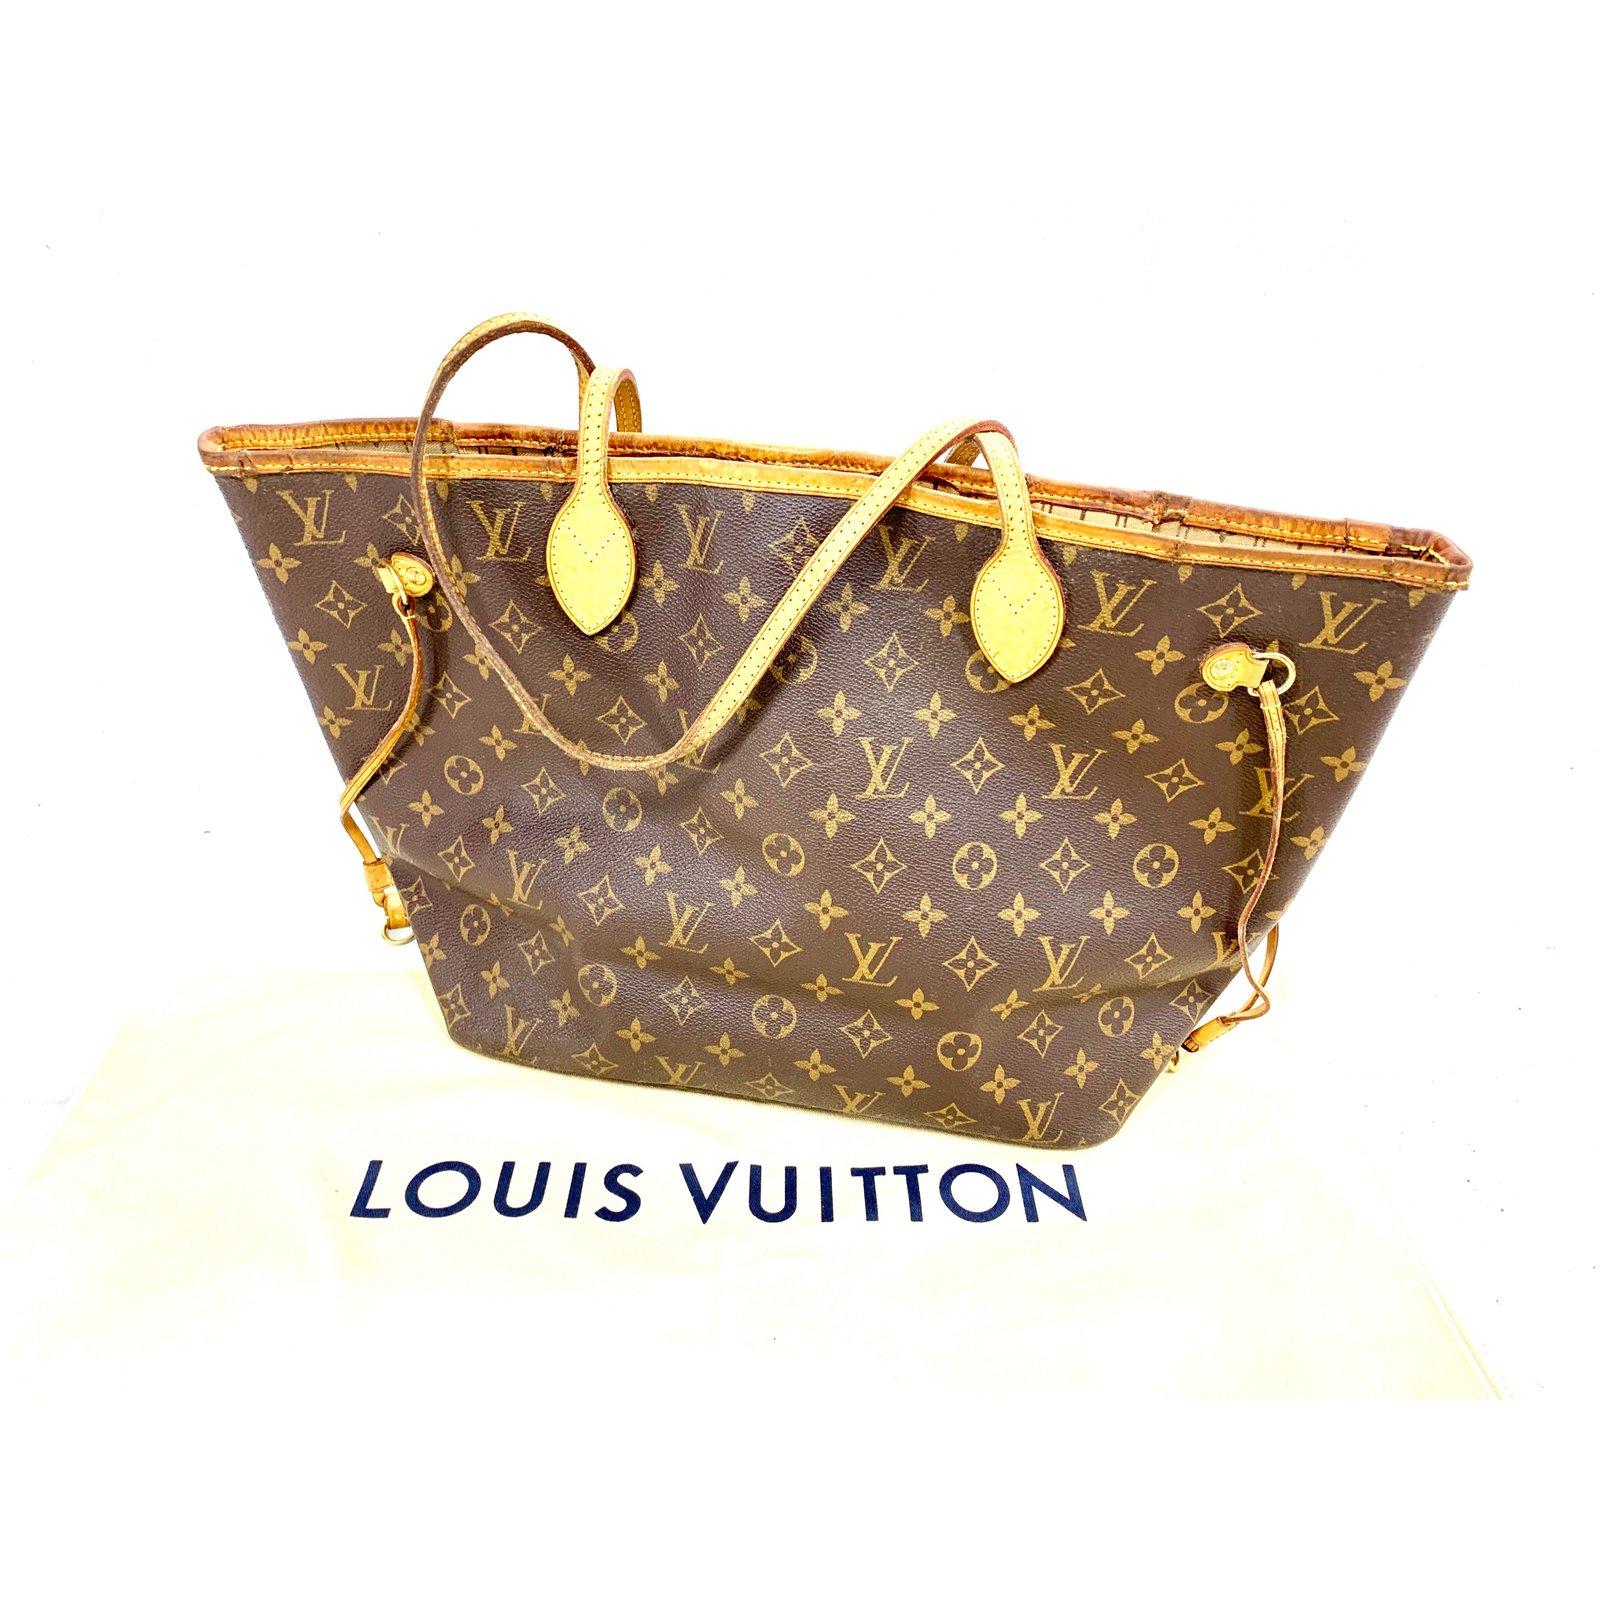 7791b8064ede Louis Vuitton NEVERFULL MM MONOGRAM Handbags Leather Brown ref.89434